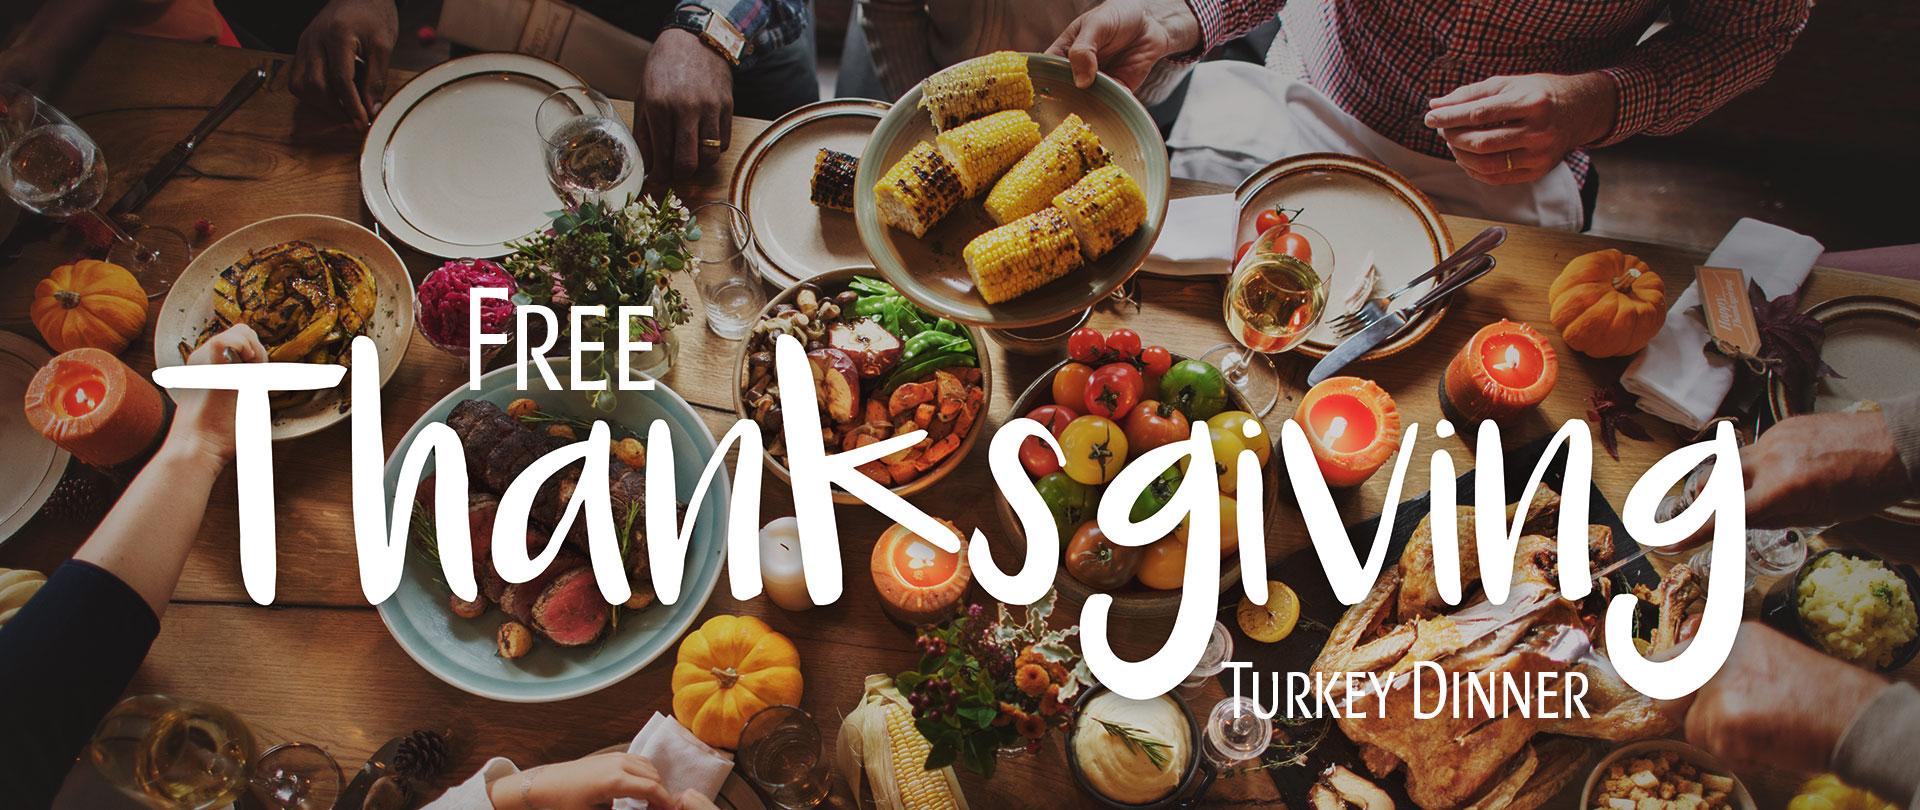 Free Thanksgiving Turkey Dinner 2019